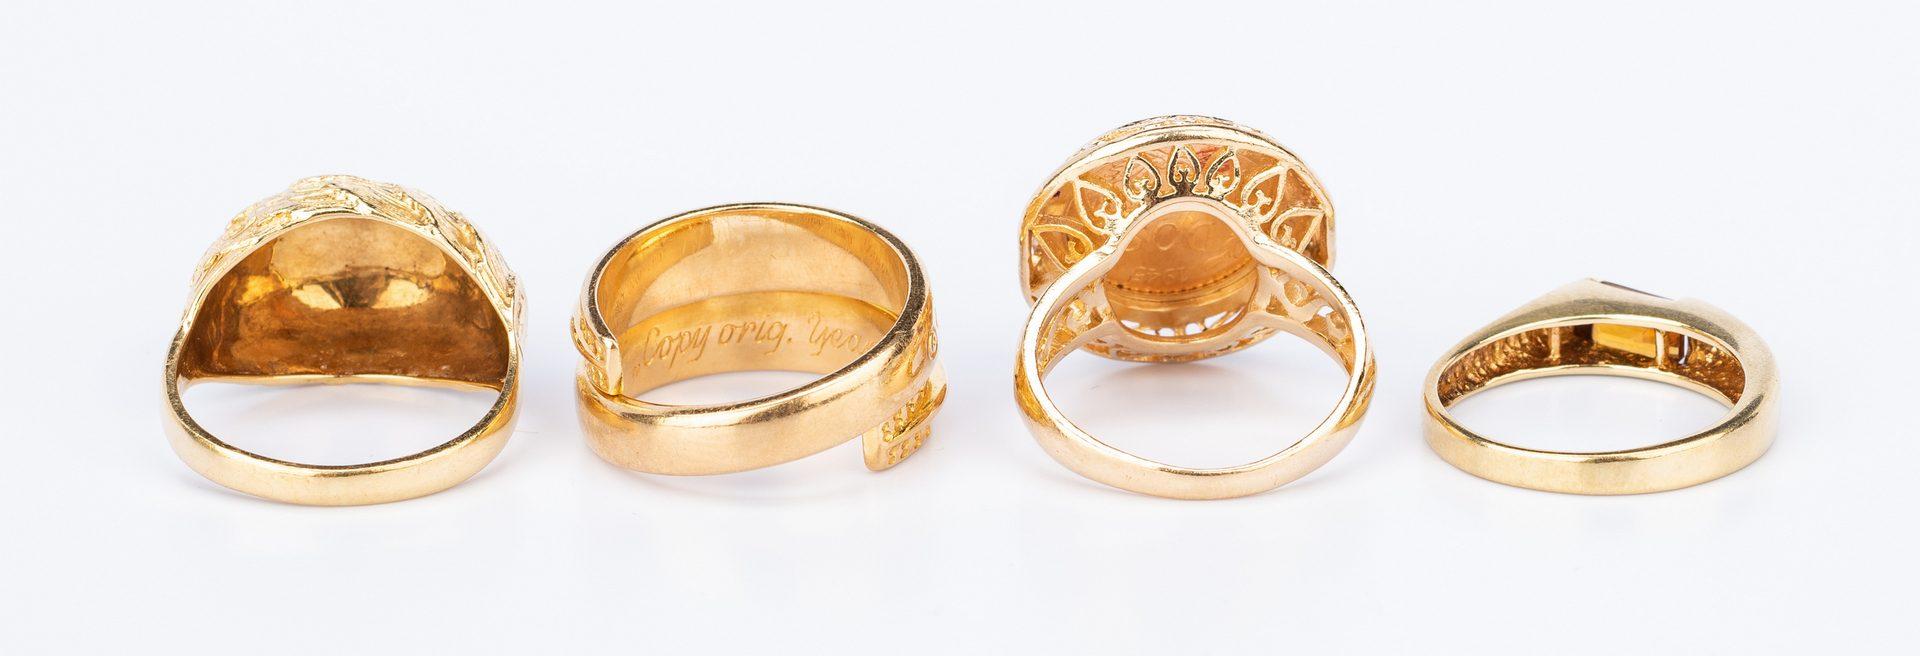 Lot 636: 4 14K & 18K Fashion Rings